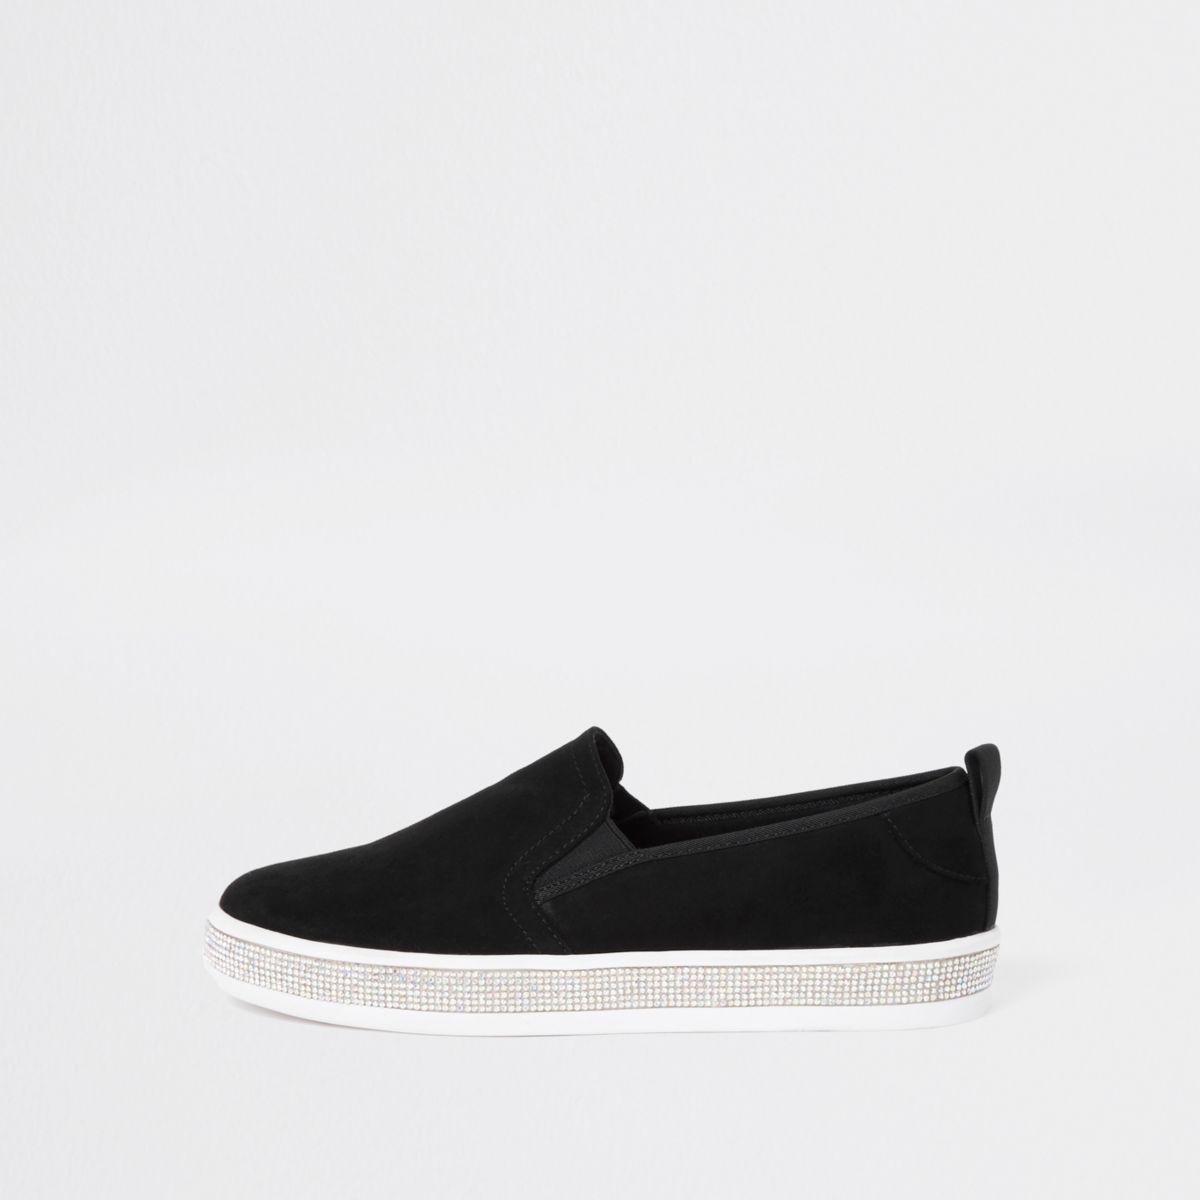 Black rhinestone sole trim plimsolls